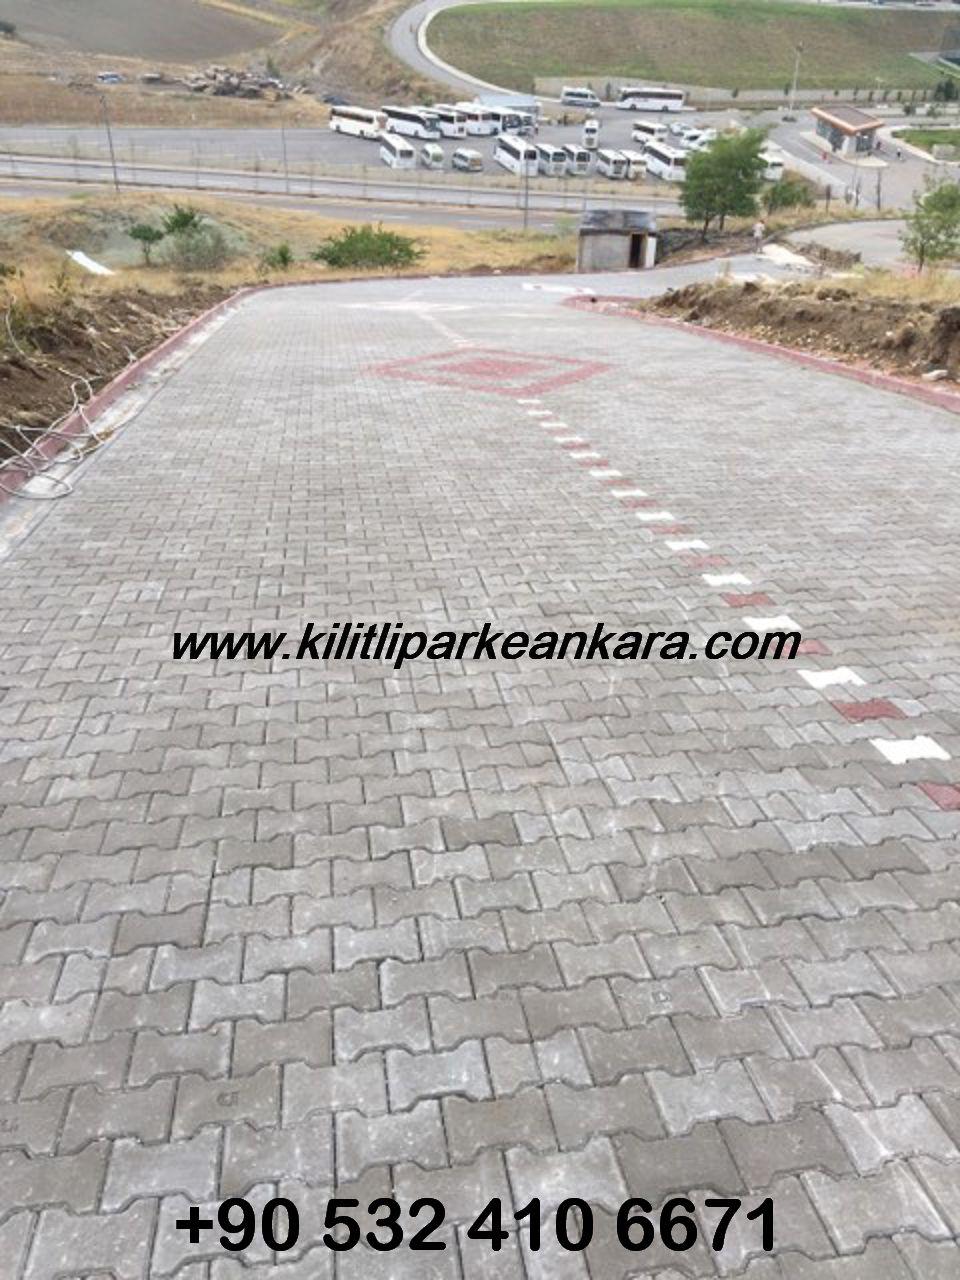 Ankara Kilit Taşı - Kilitli Parke Taşı Ustası (017)